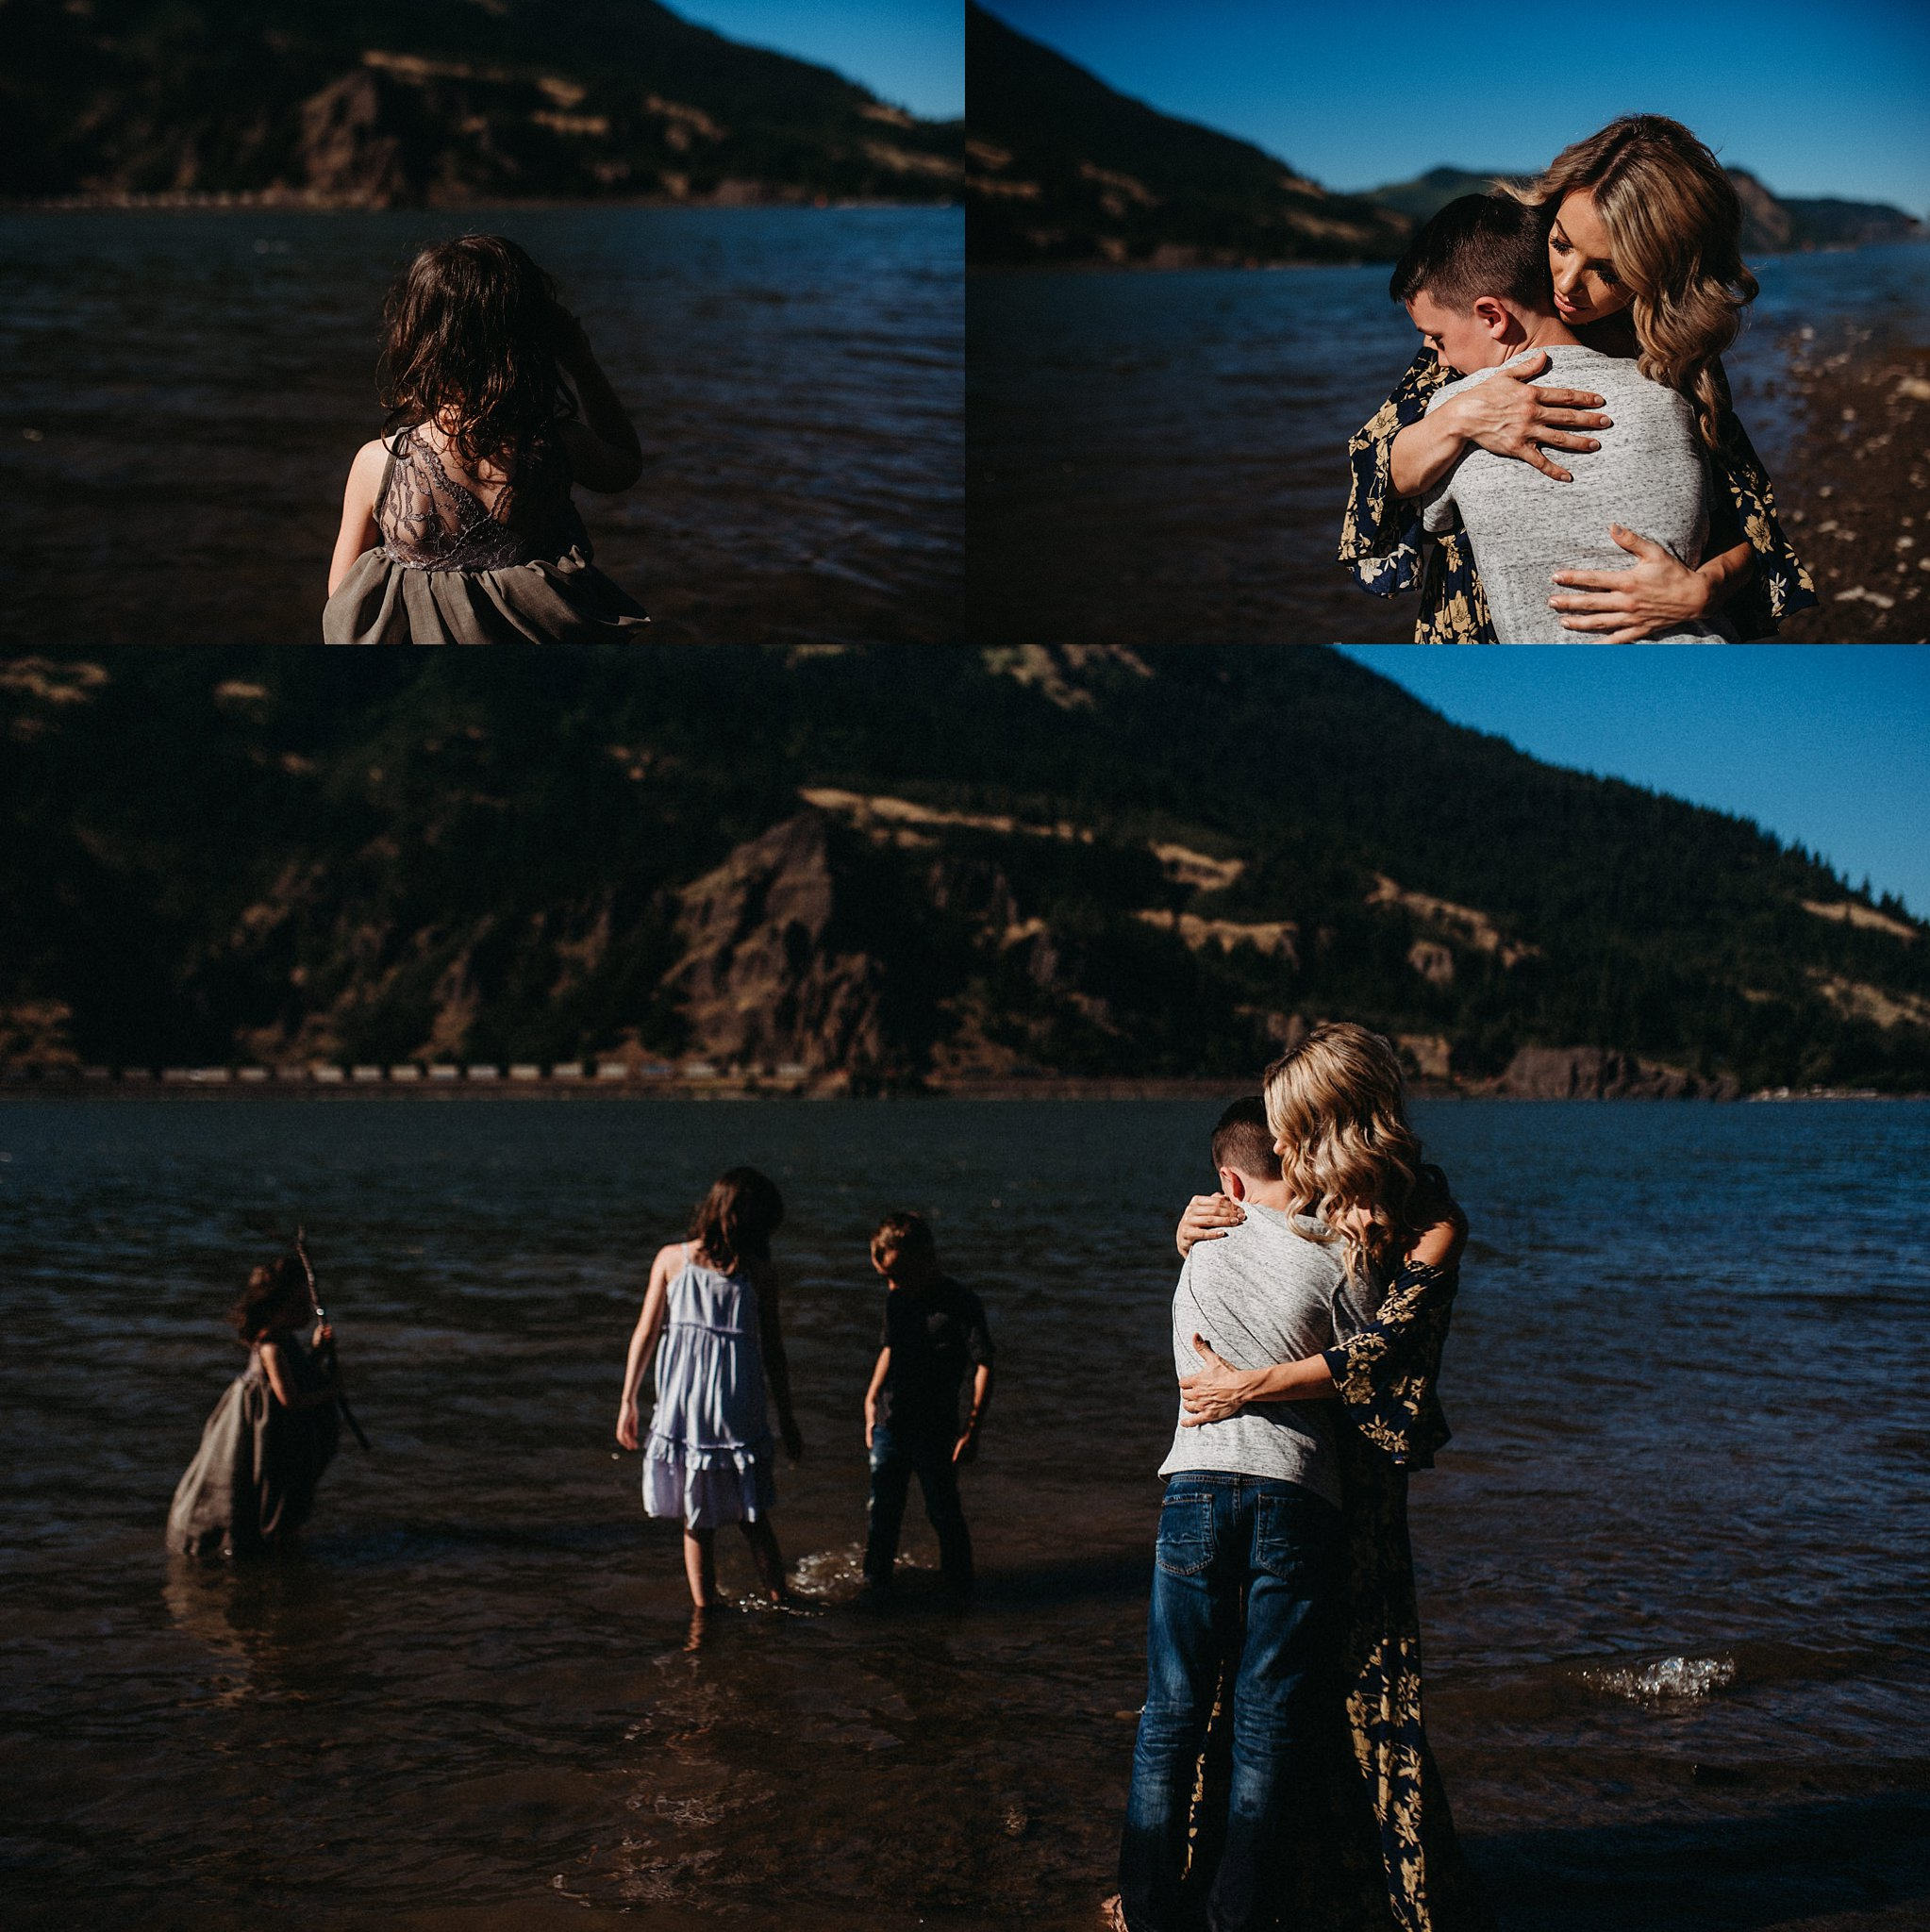 twyla jones photography - treasure coast florida - intimate couples session urban cowboy b&b | brooklyn New York_0050.jpg